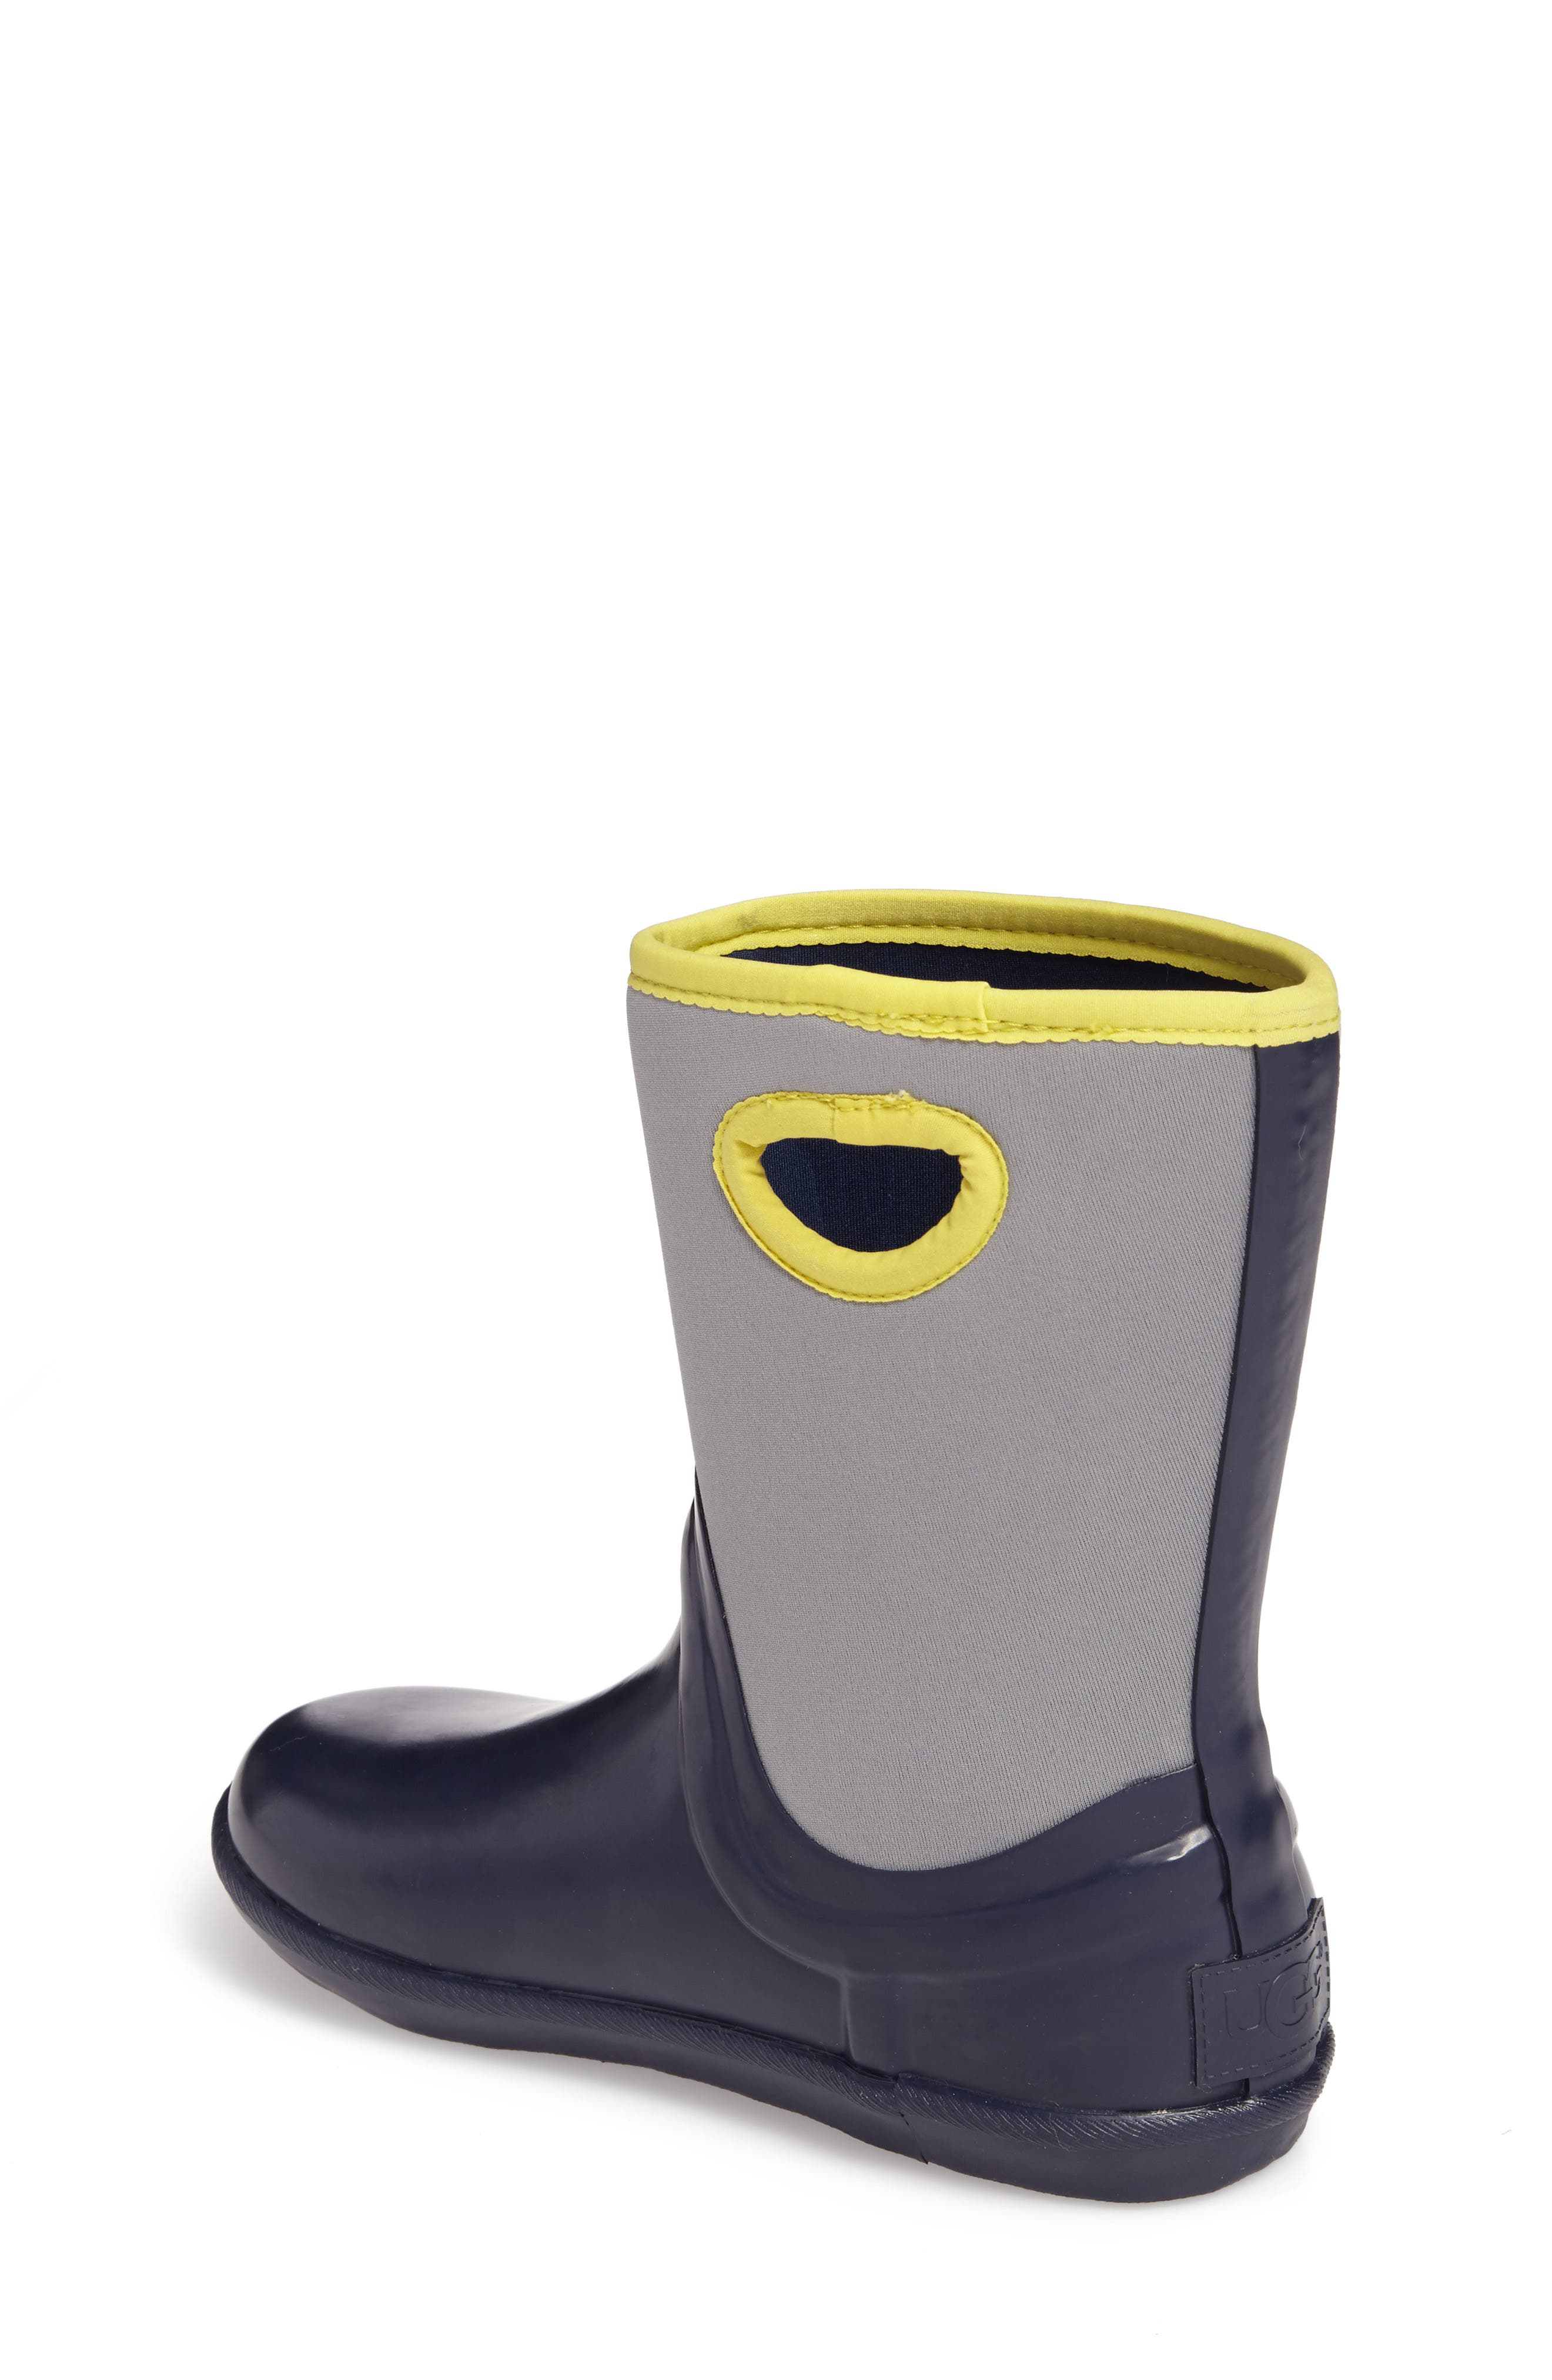 Kex Waterproof Boot,                             Alternate thumbnail 5, color,